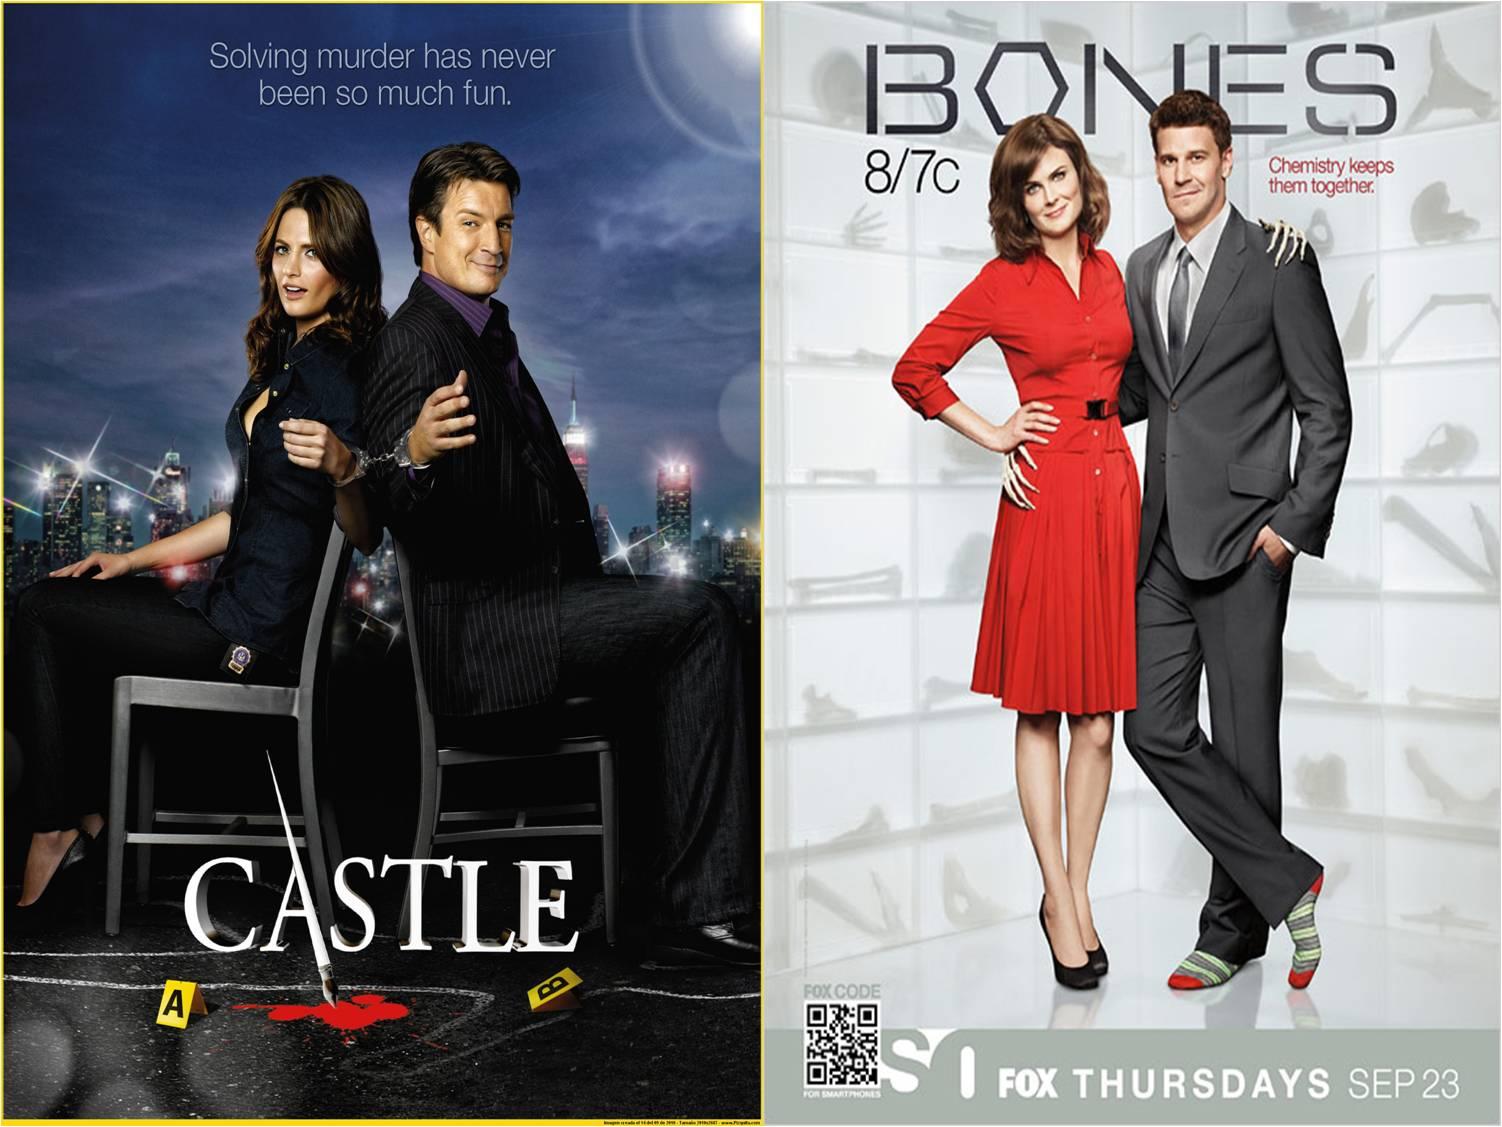 http://1.bp.blogspot.com/_gad_VVZcYXQ/TJmZ--xiLUI/AAAAAAAAARg/RMUs0bLyLPI/s1600/Bones_castle_season201011.jpg